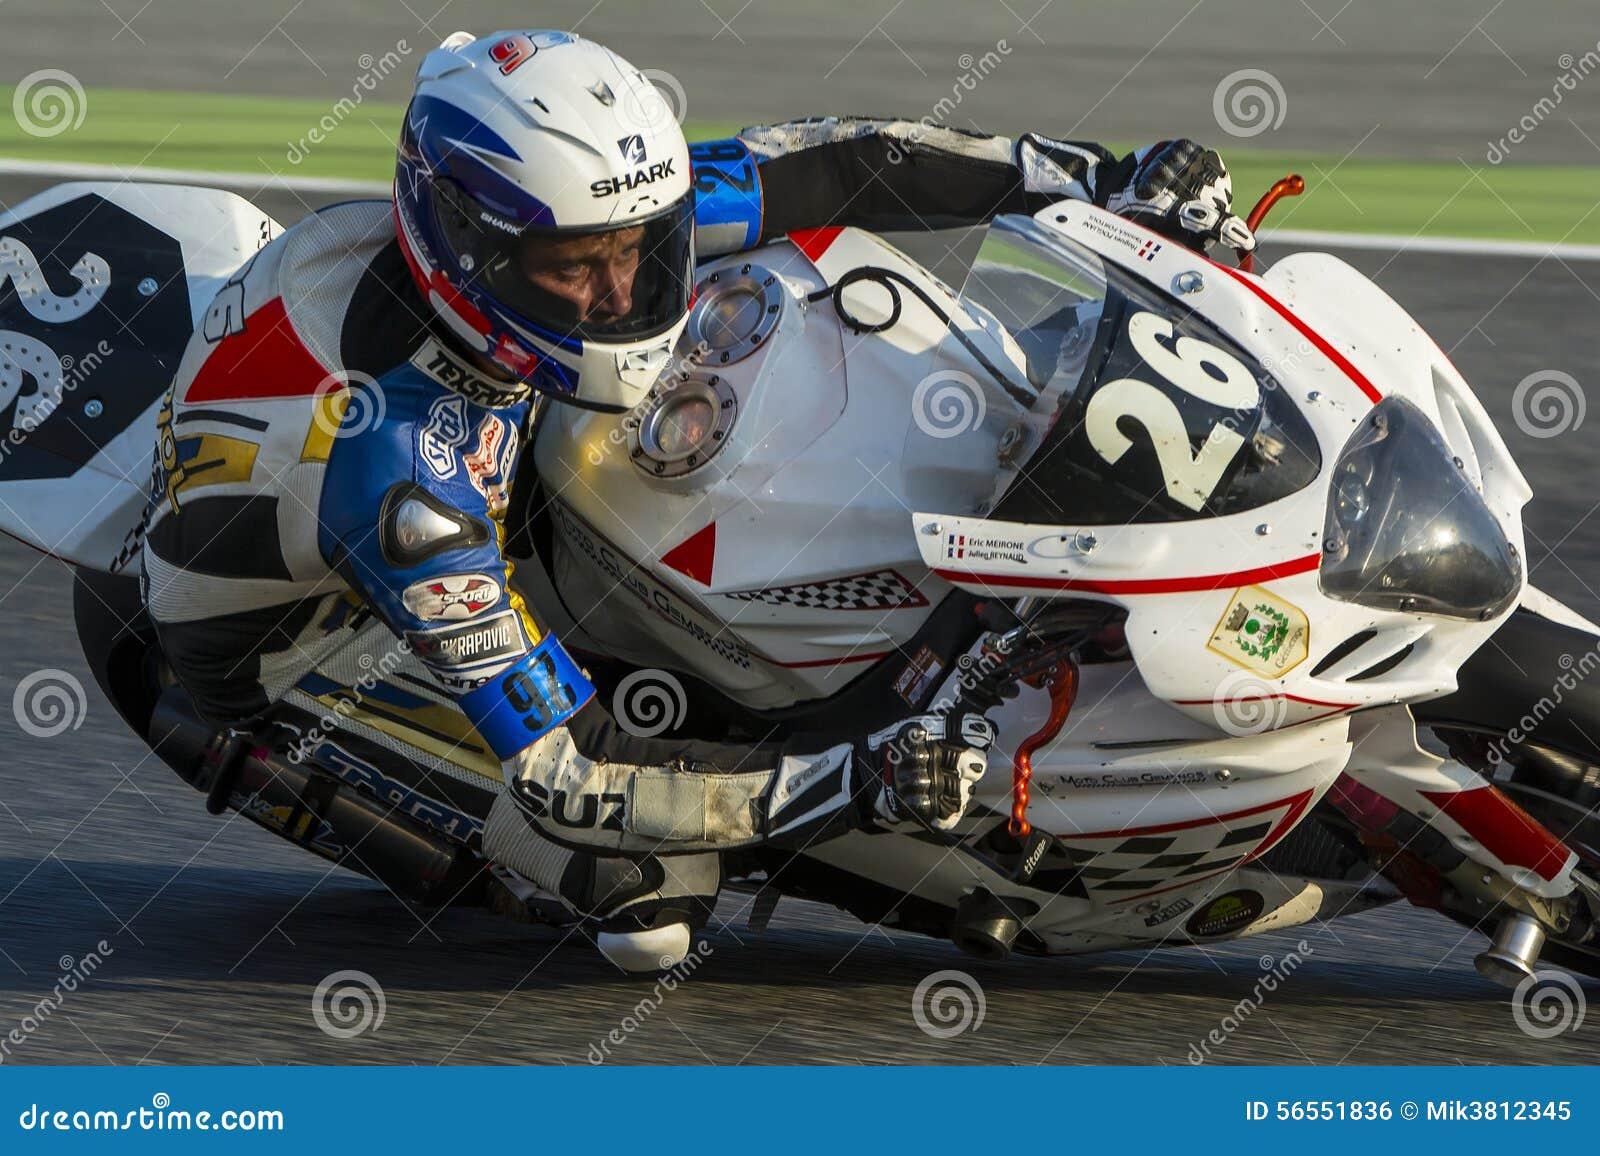 Download Ομάδα Moto Club De Gemenos Racing 24 ώρες Εκδοτική Εικόνες - εικόνα από ιούλιος, δρομέας: 56551836